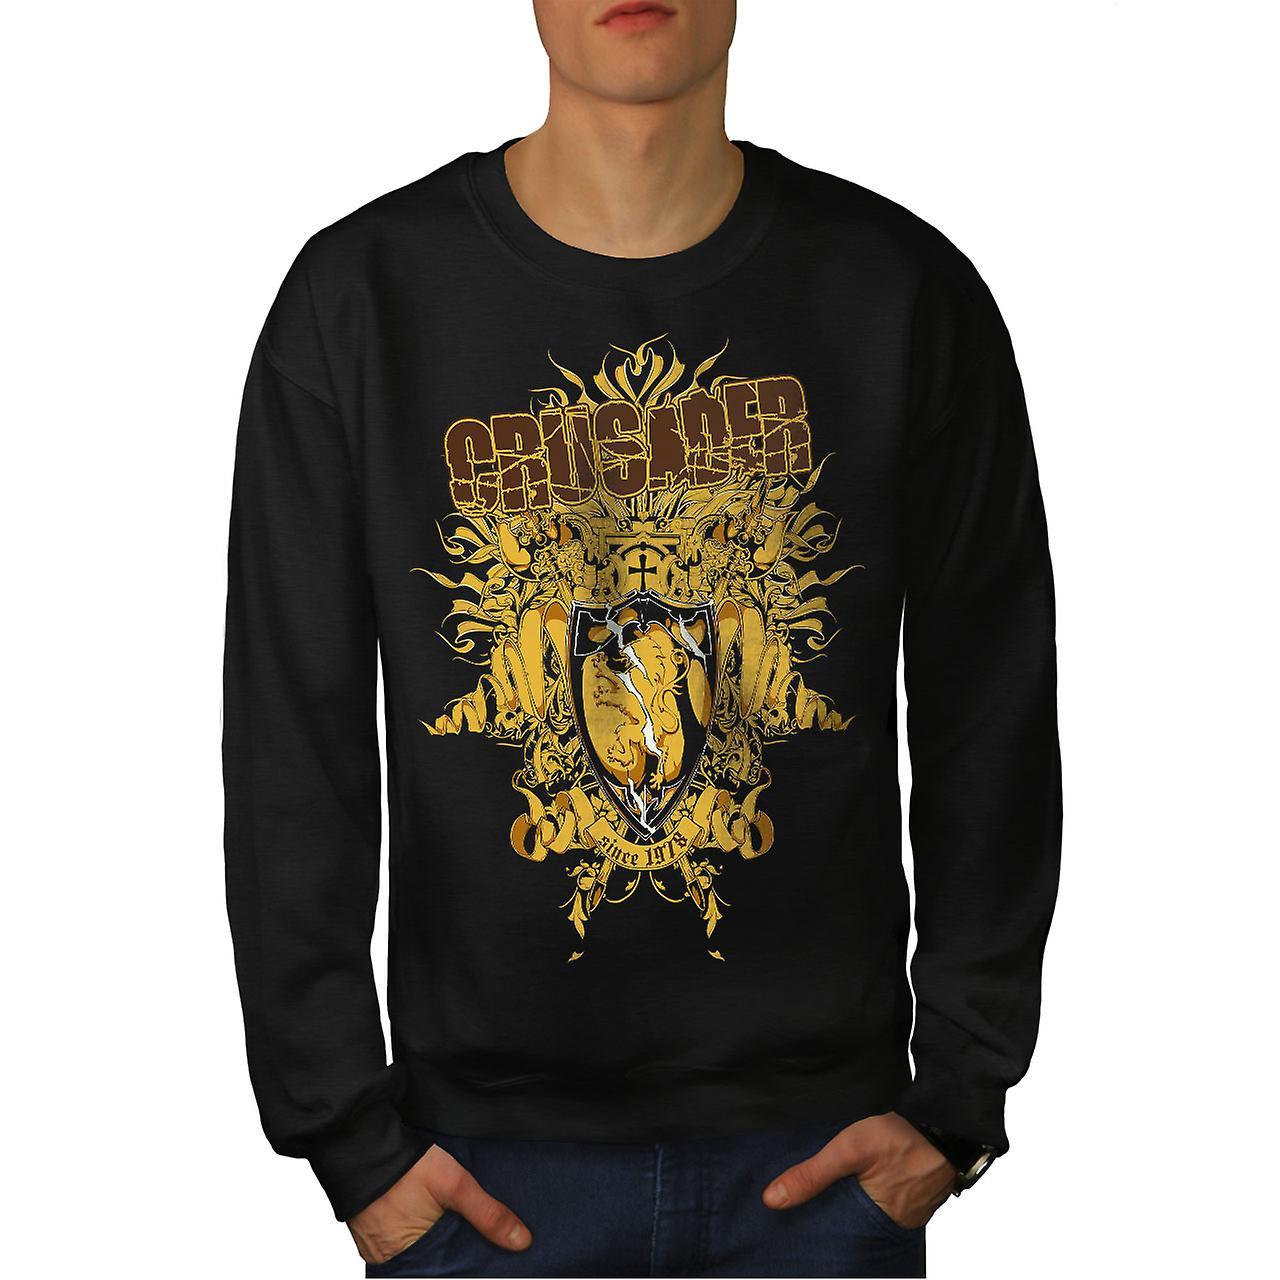 Kreuzritter-Schild Mode Herren Sweatshirt schwarz | Wellcoda